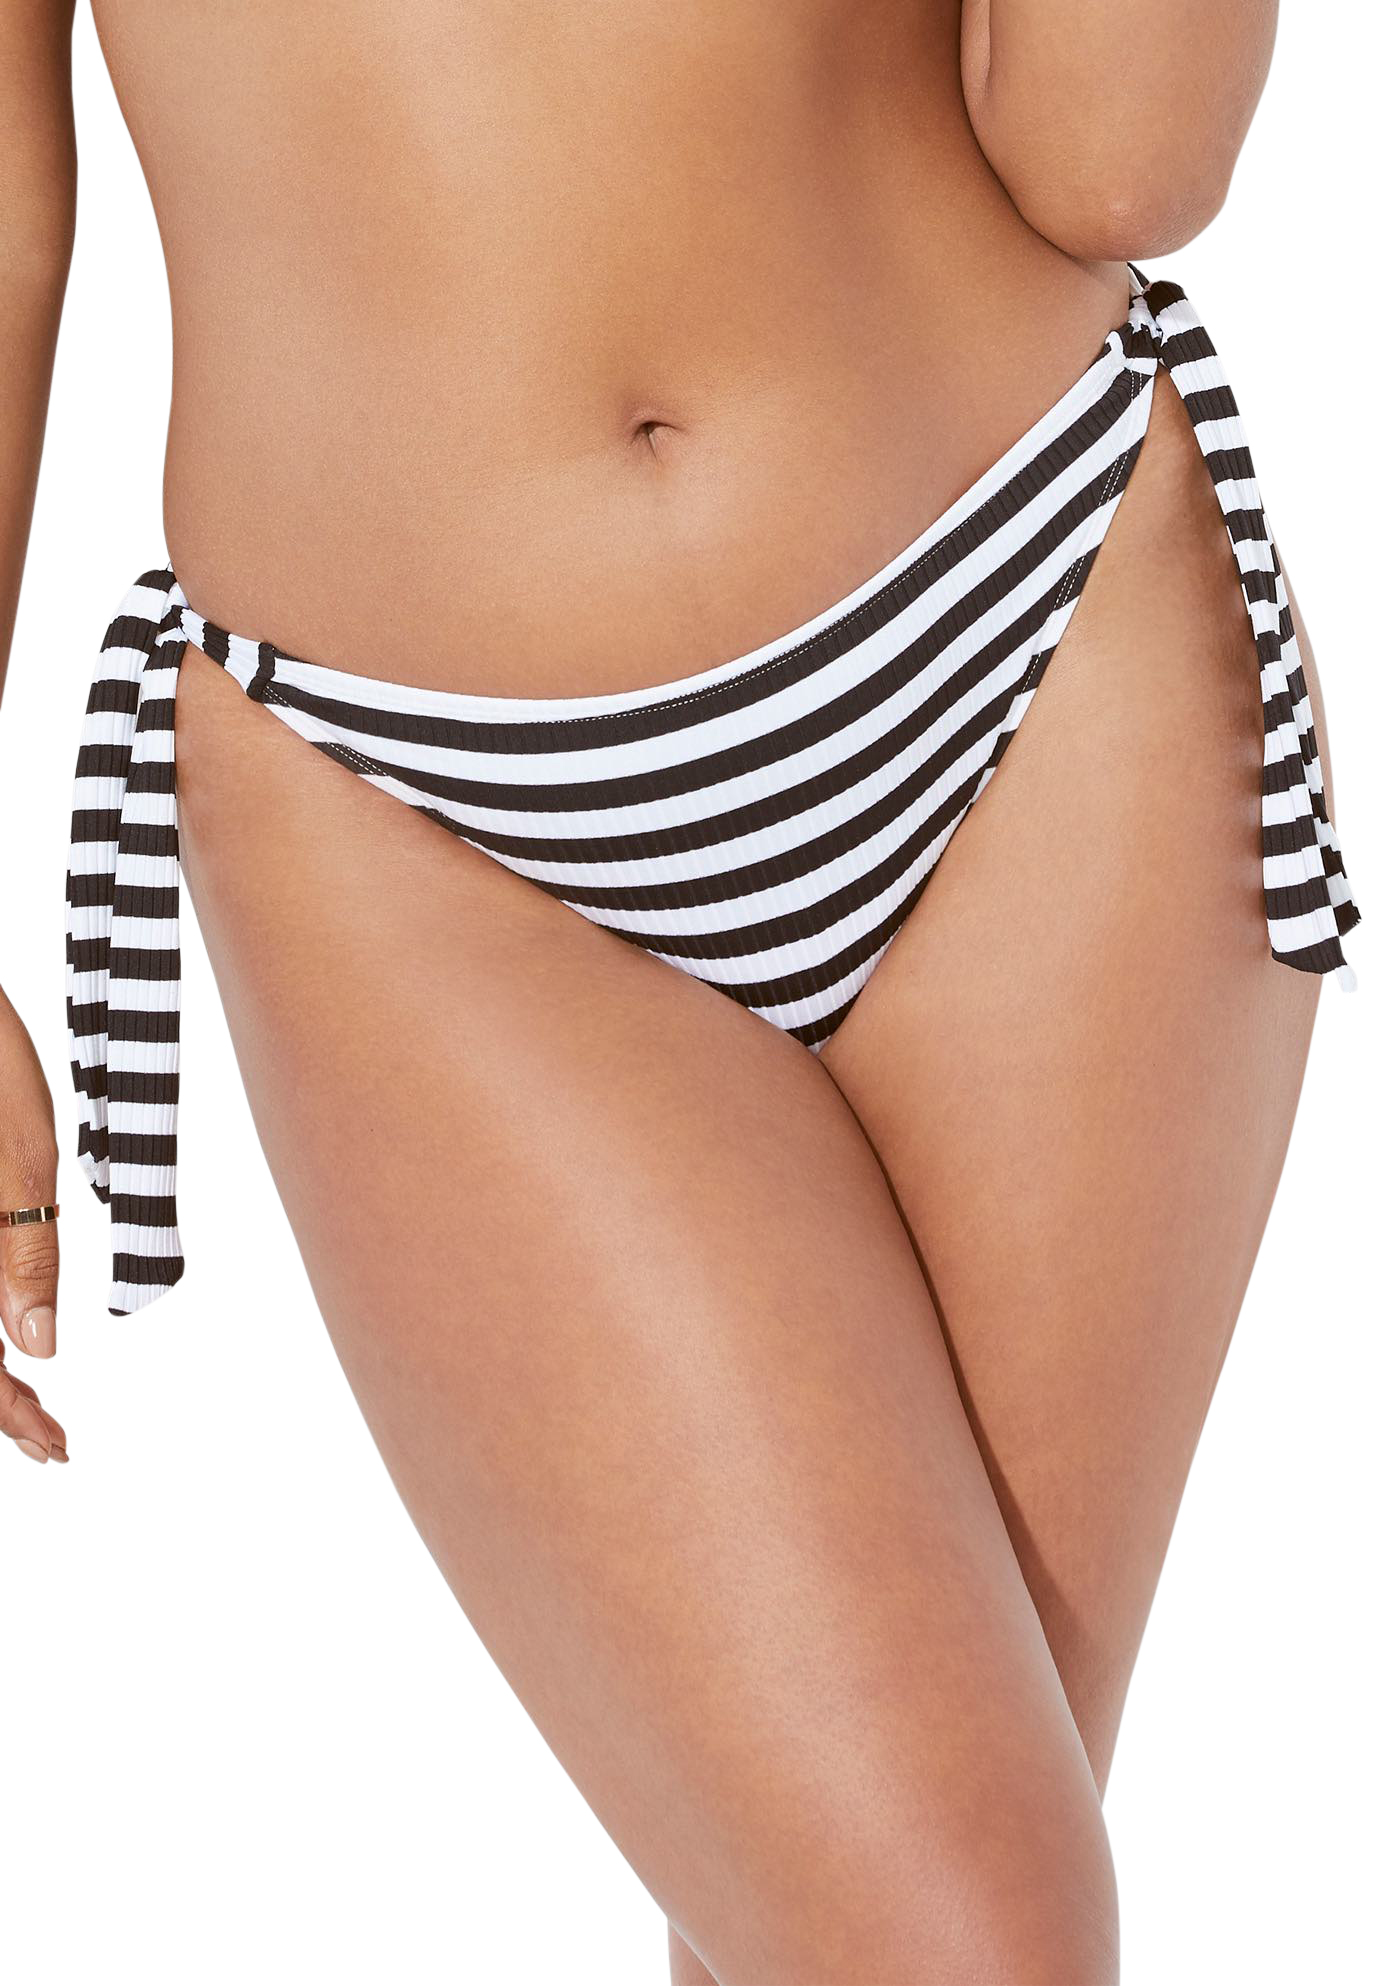 Plus Size Women's Ashley Graham Elite Bikini Bottom by Swimsuits For All in Stripe